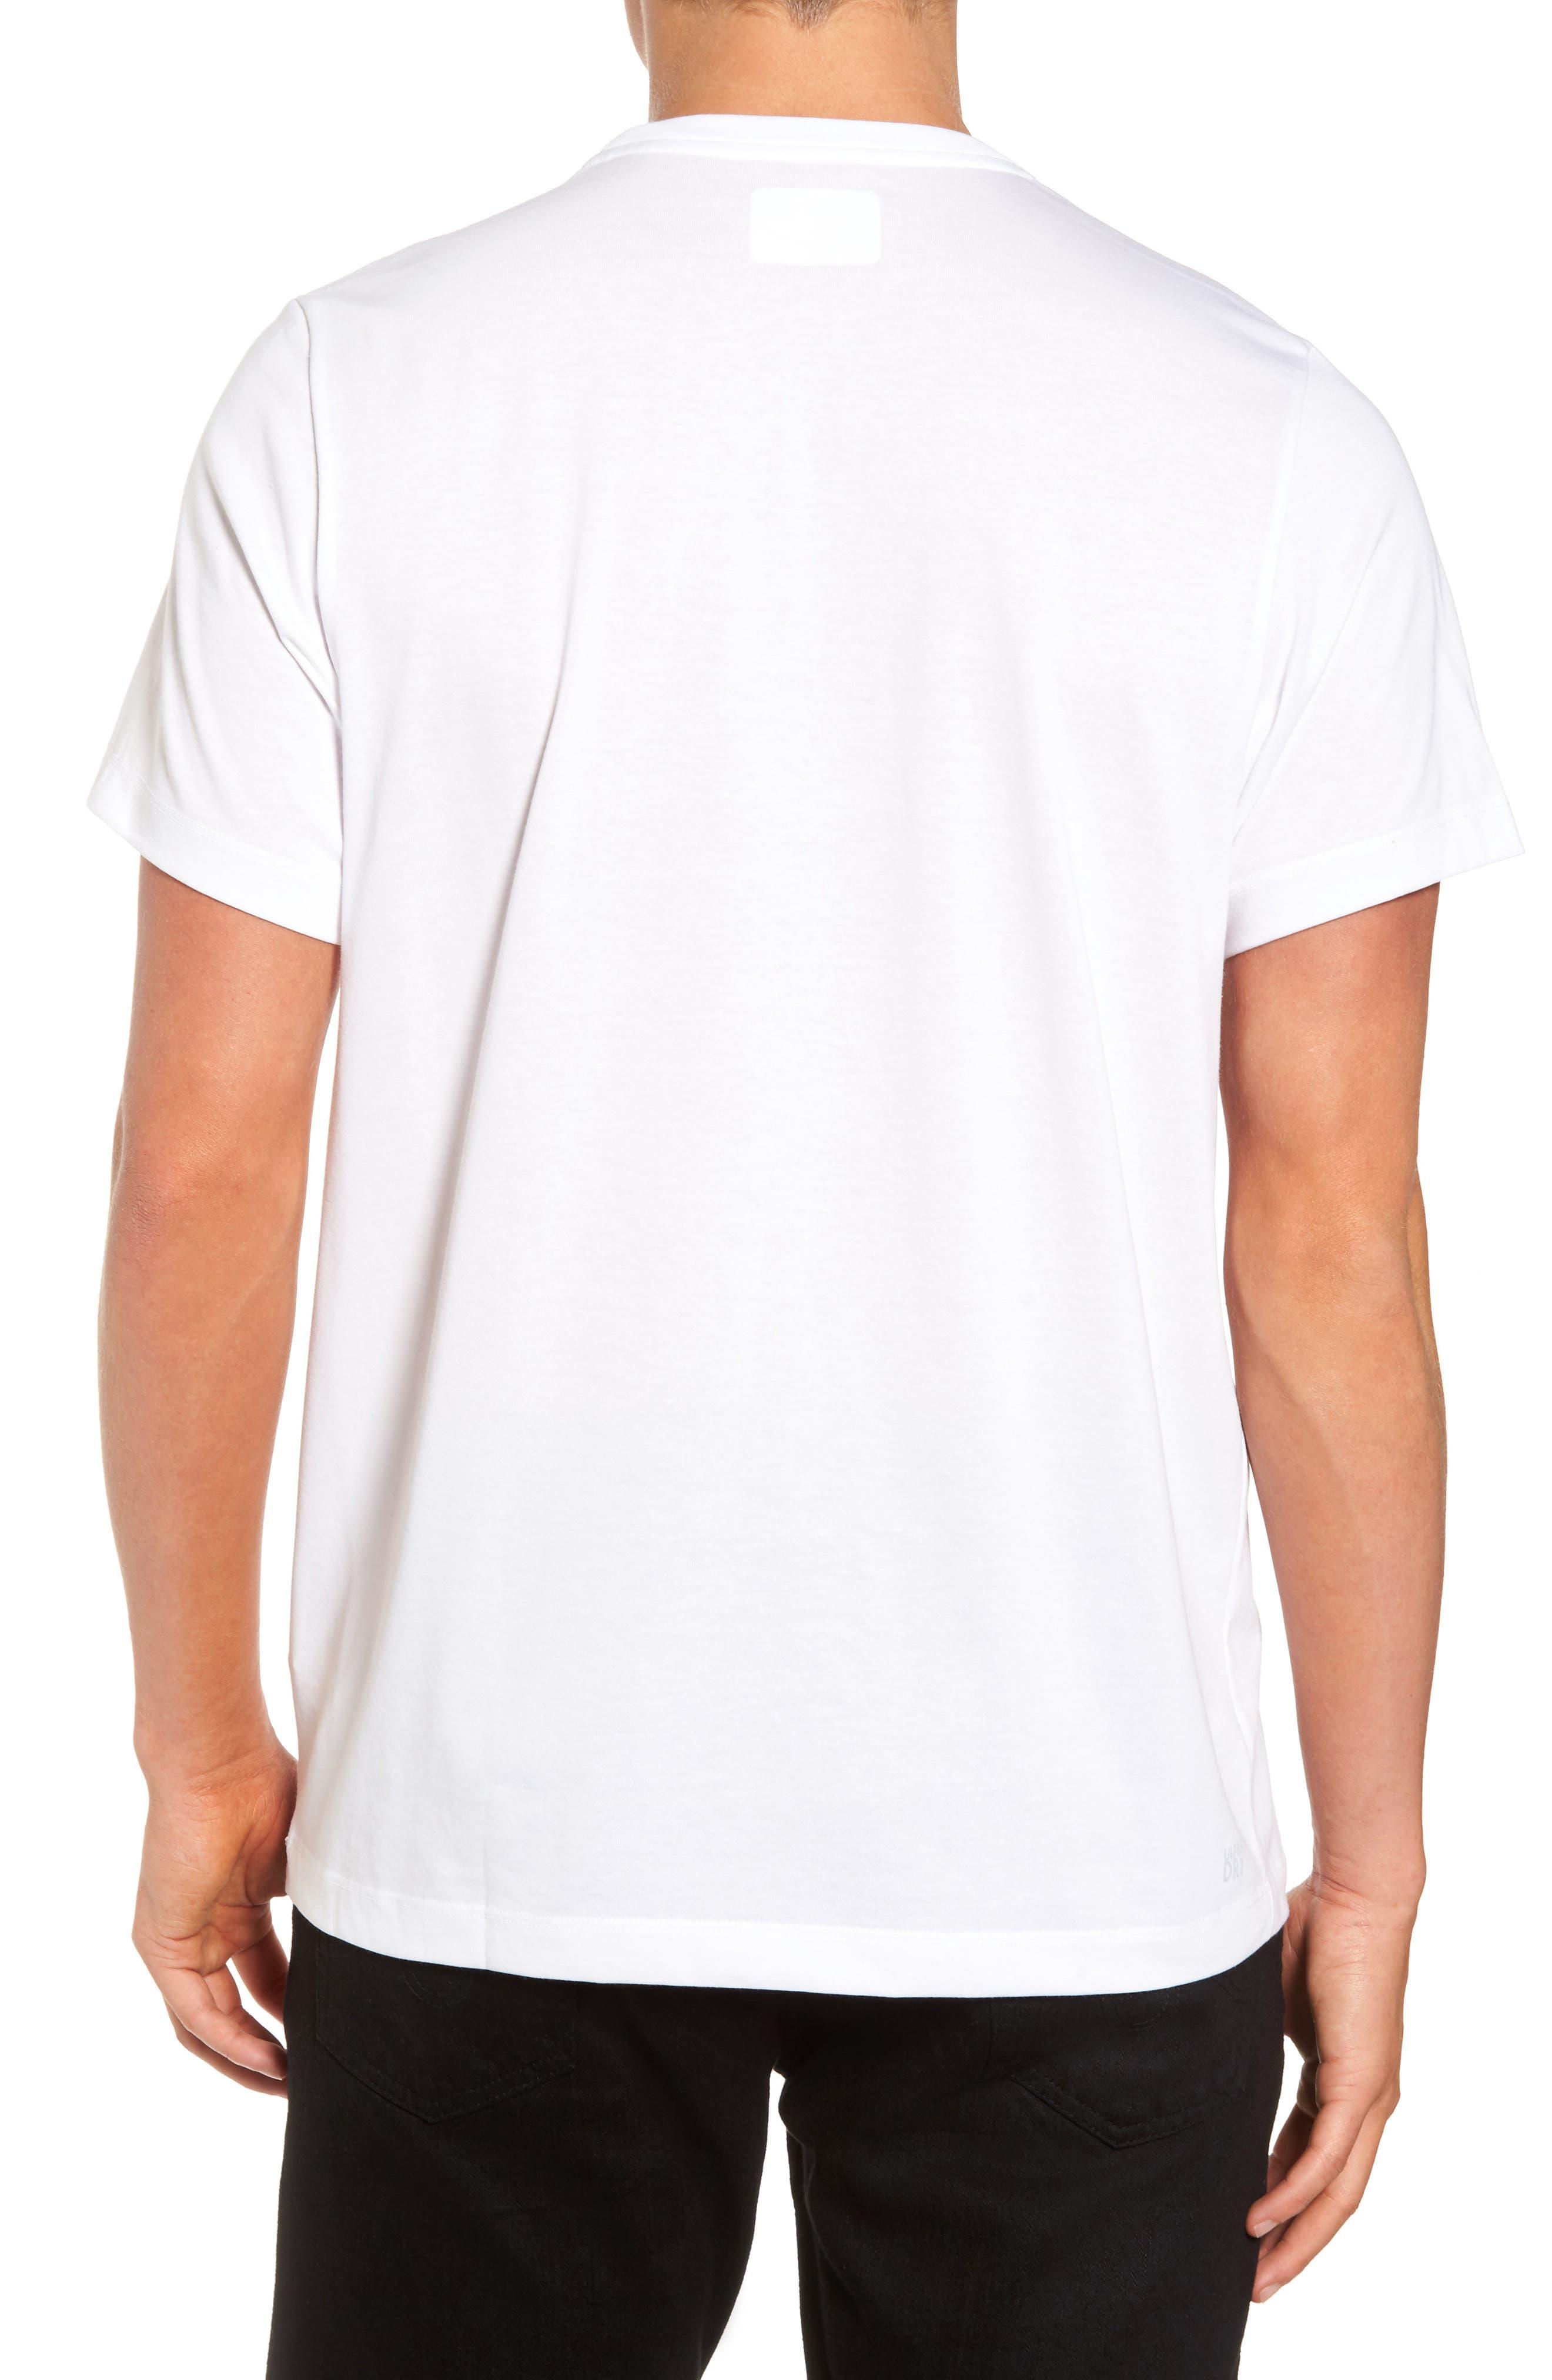 Alternate Image 2  - Lacoste Tech Vertical Stripe Graphic T-Shirt